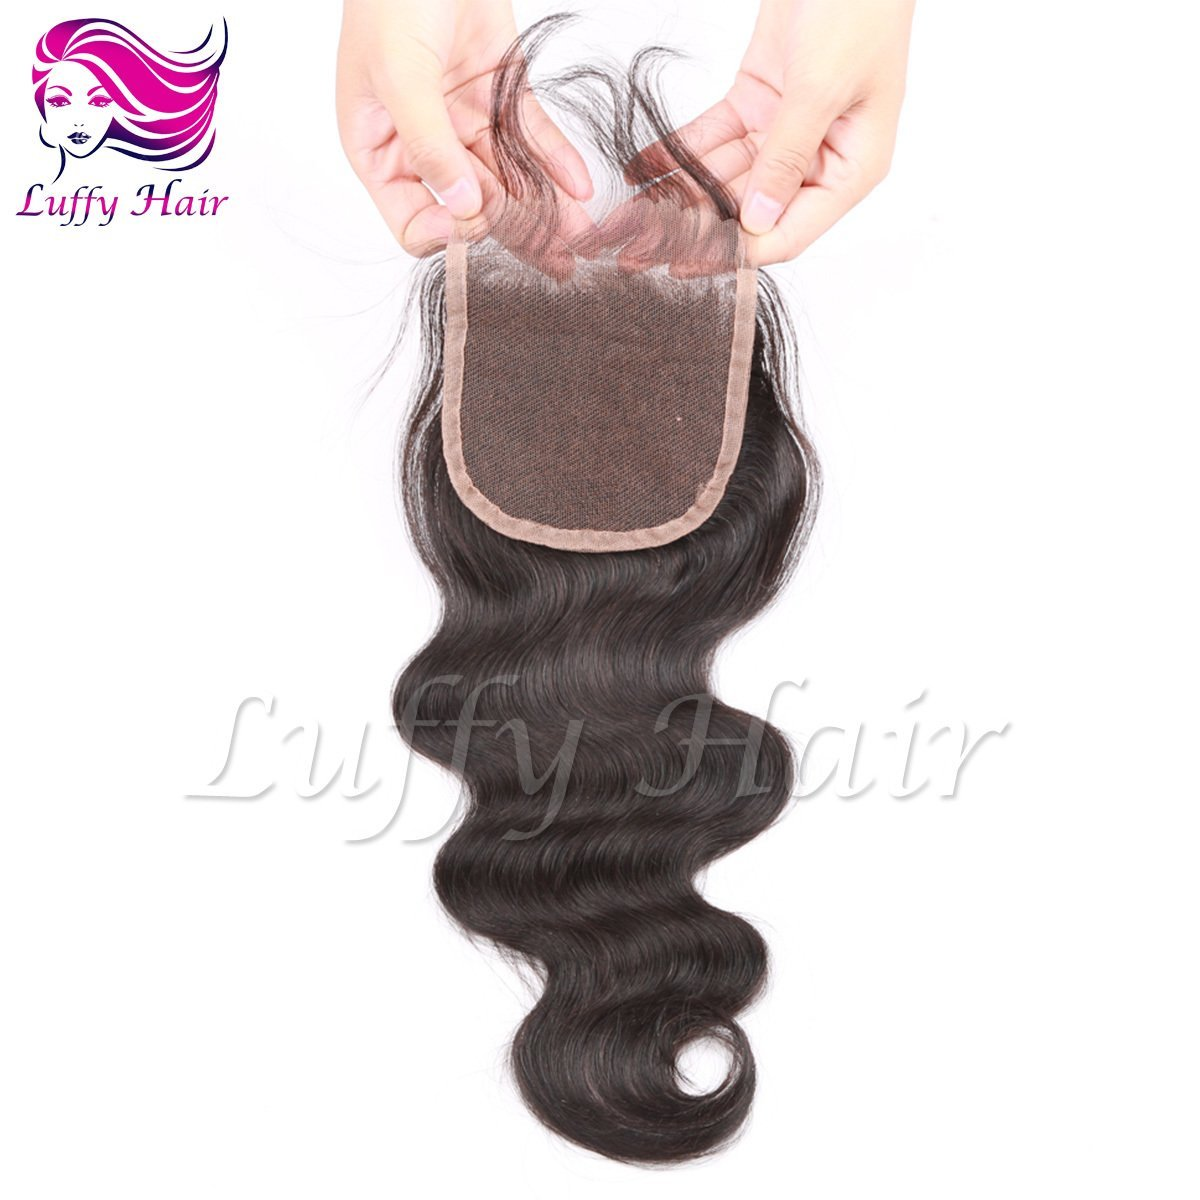 8A Virgin Human Hair 4x4 Body Wave Lace Closure- KCL008